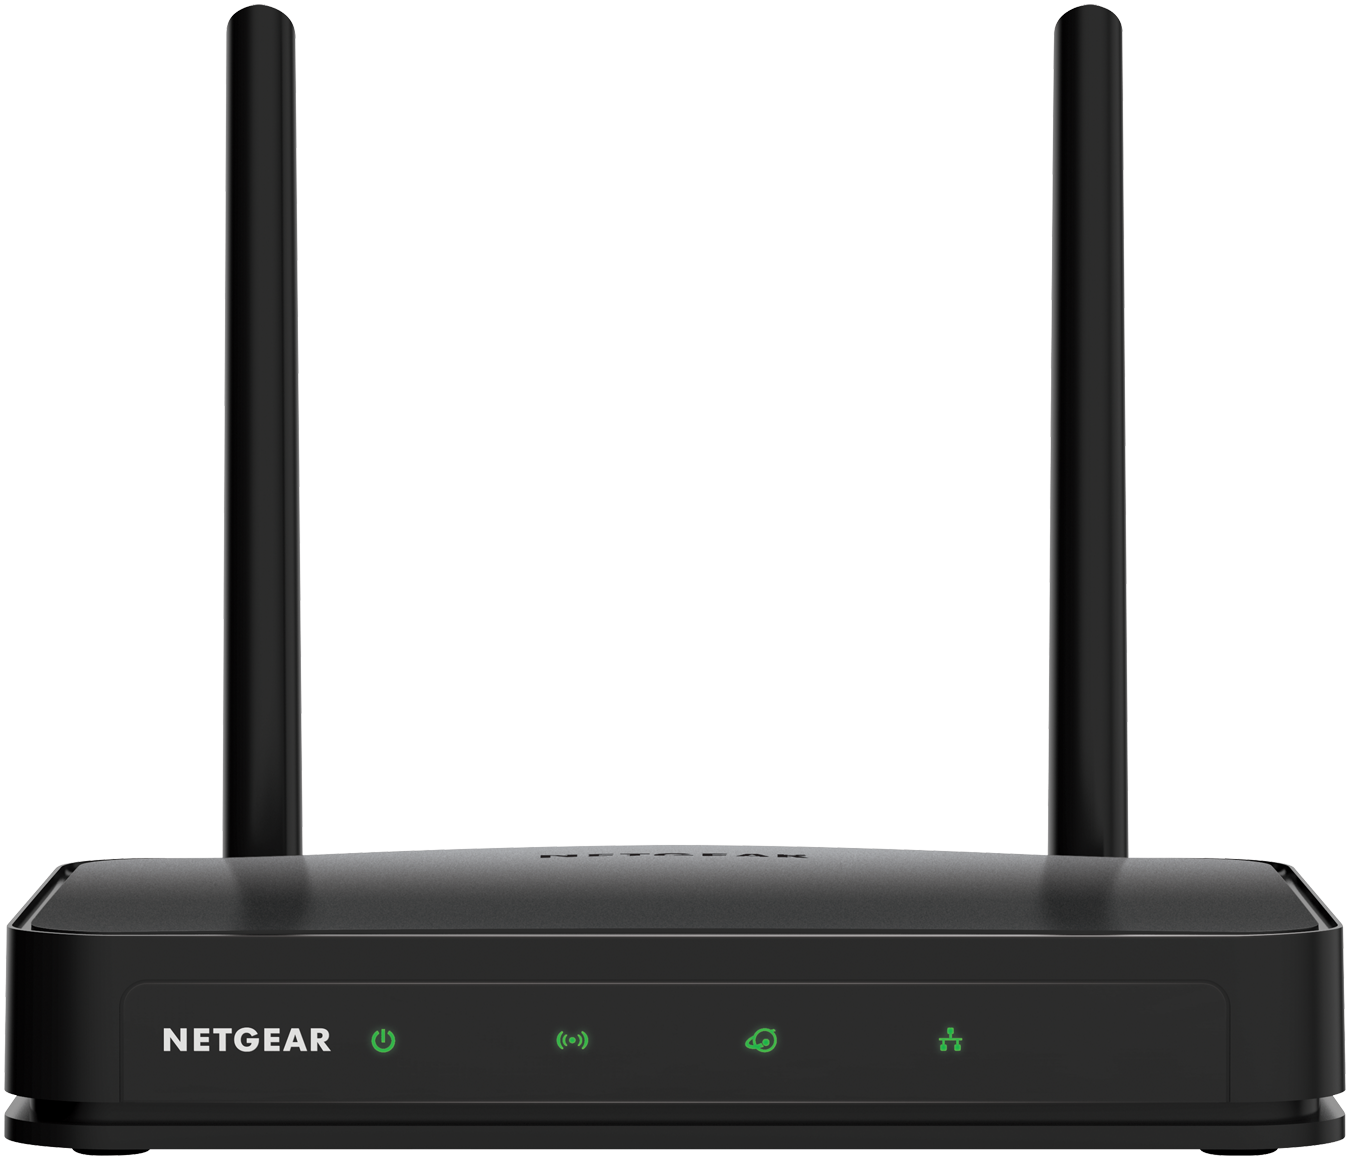 netgear router not configured correctly